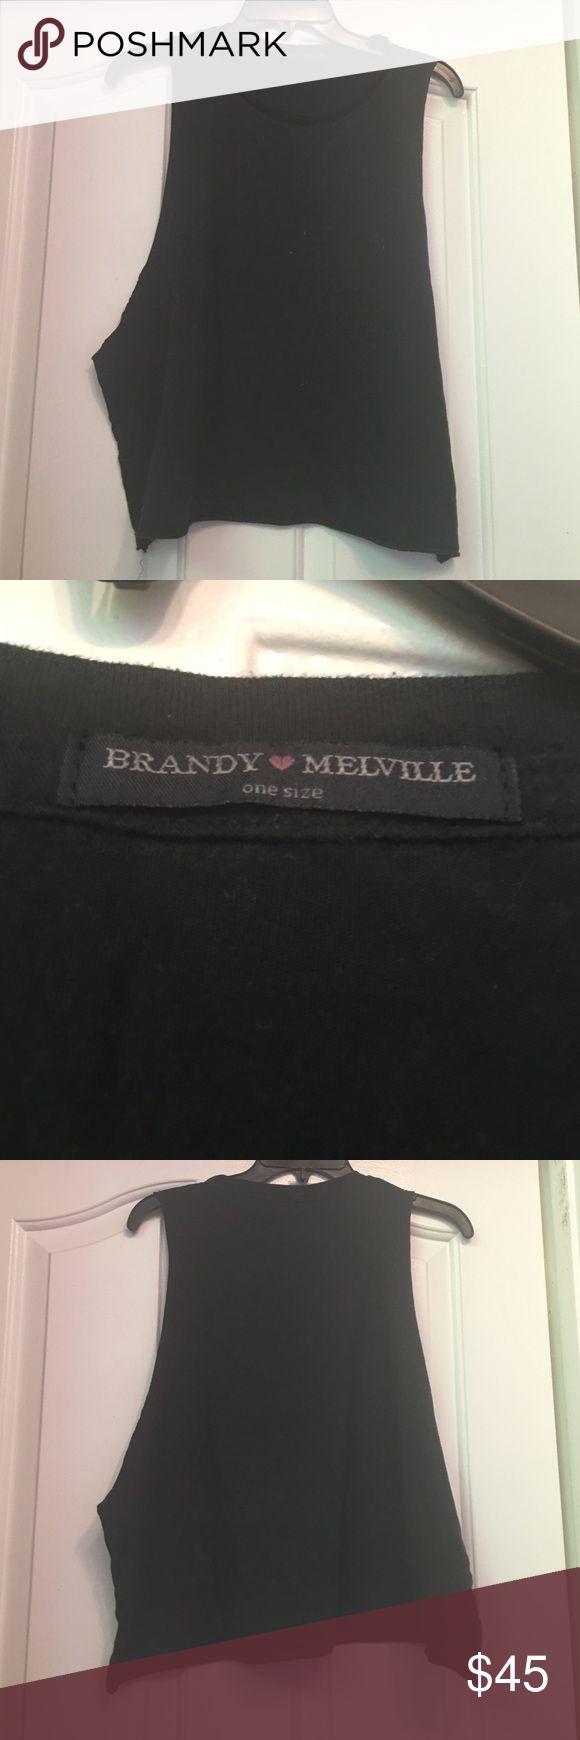 Fancy NWOT Brandy Melville Black Tank Top Size Small